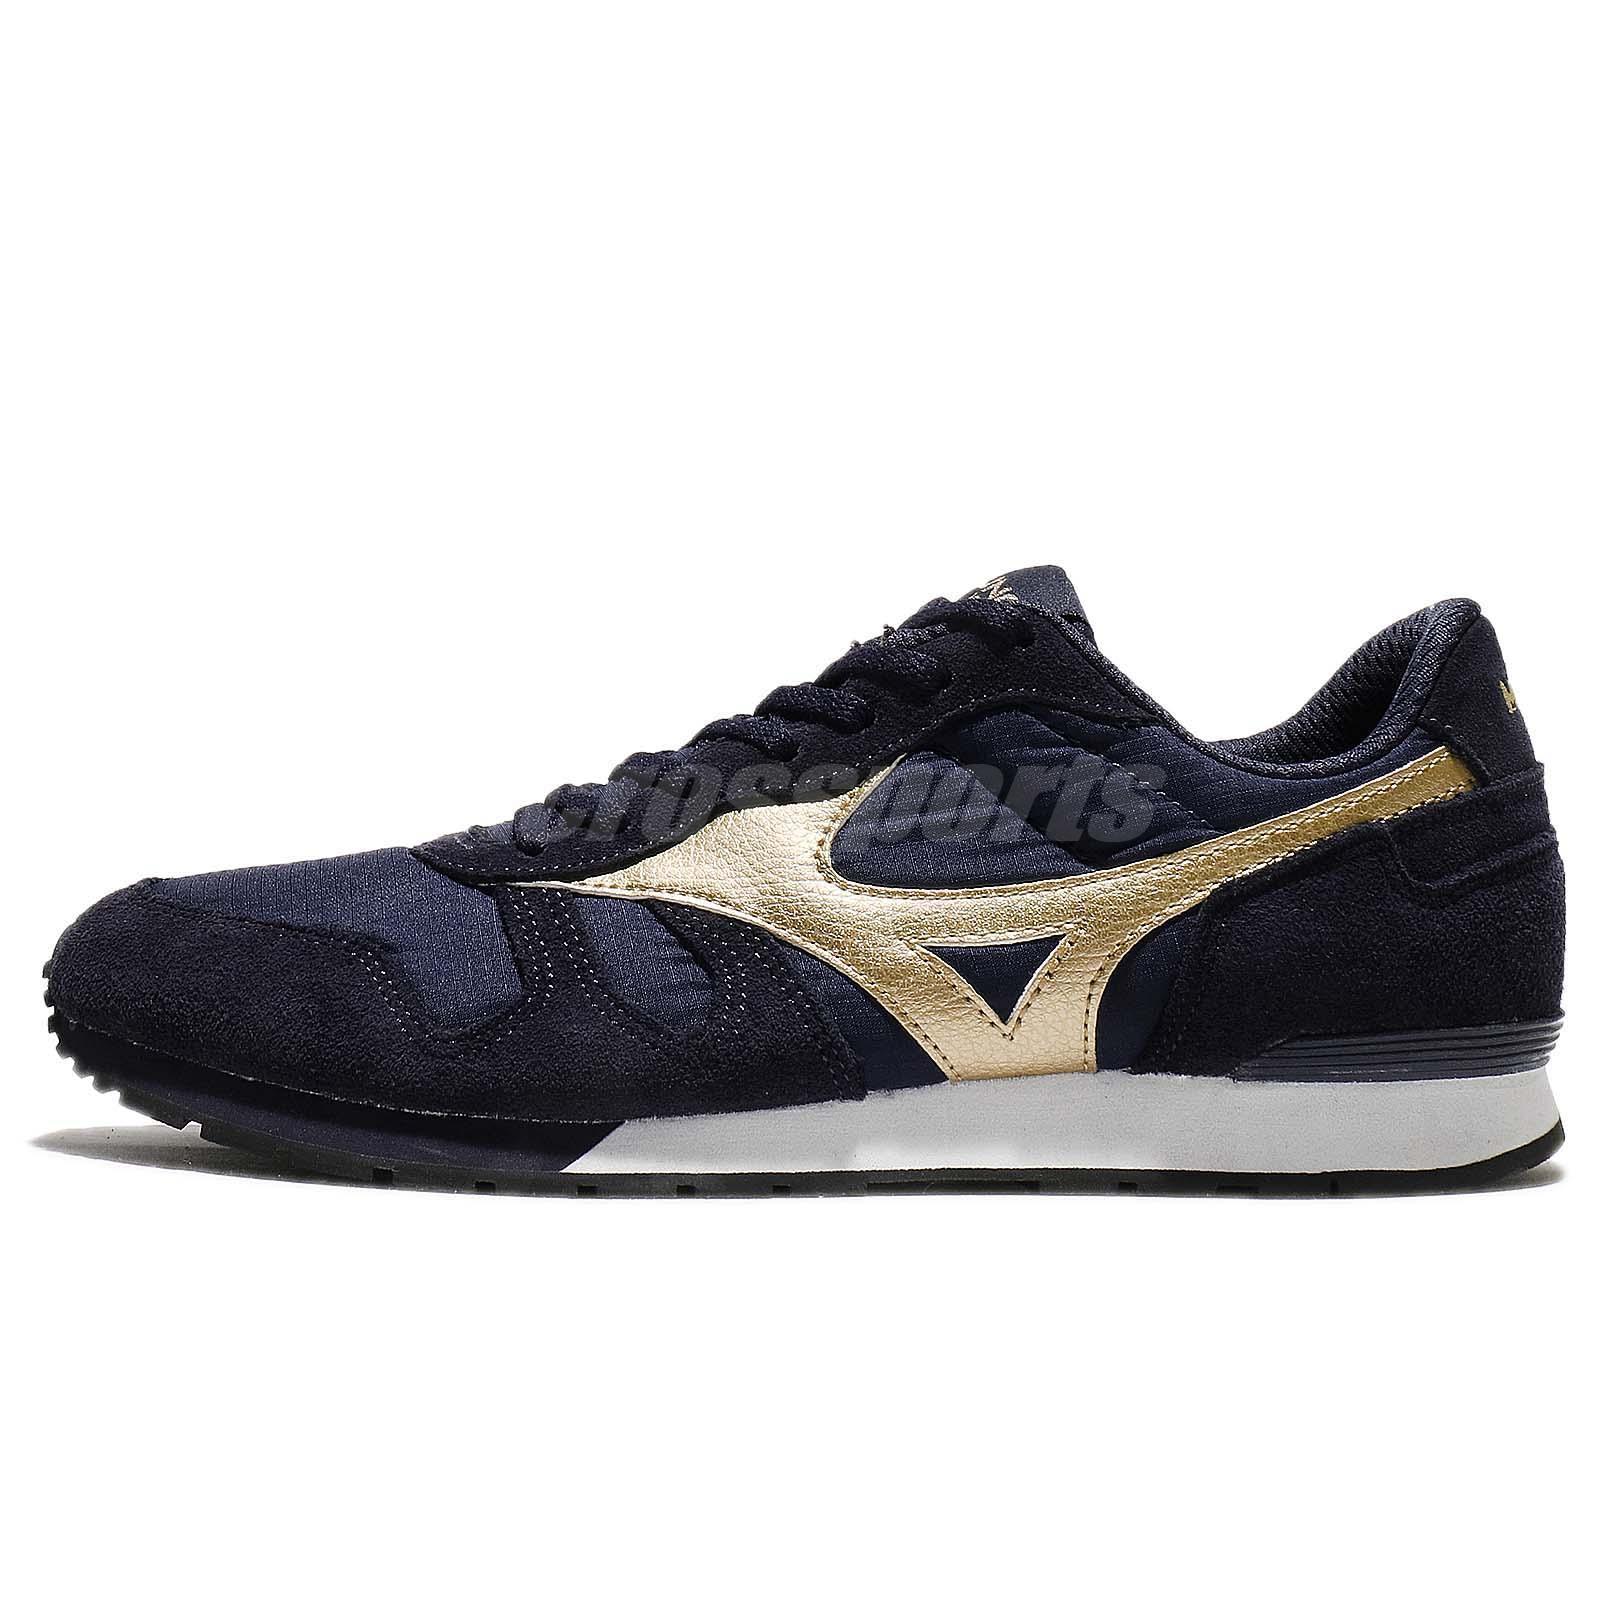 Mizuno Mizuno ML87 Navy Gold Men Lifestyle Running Shoes Sneakers D1GA1702-14 a3saJ